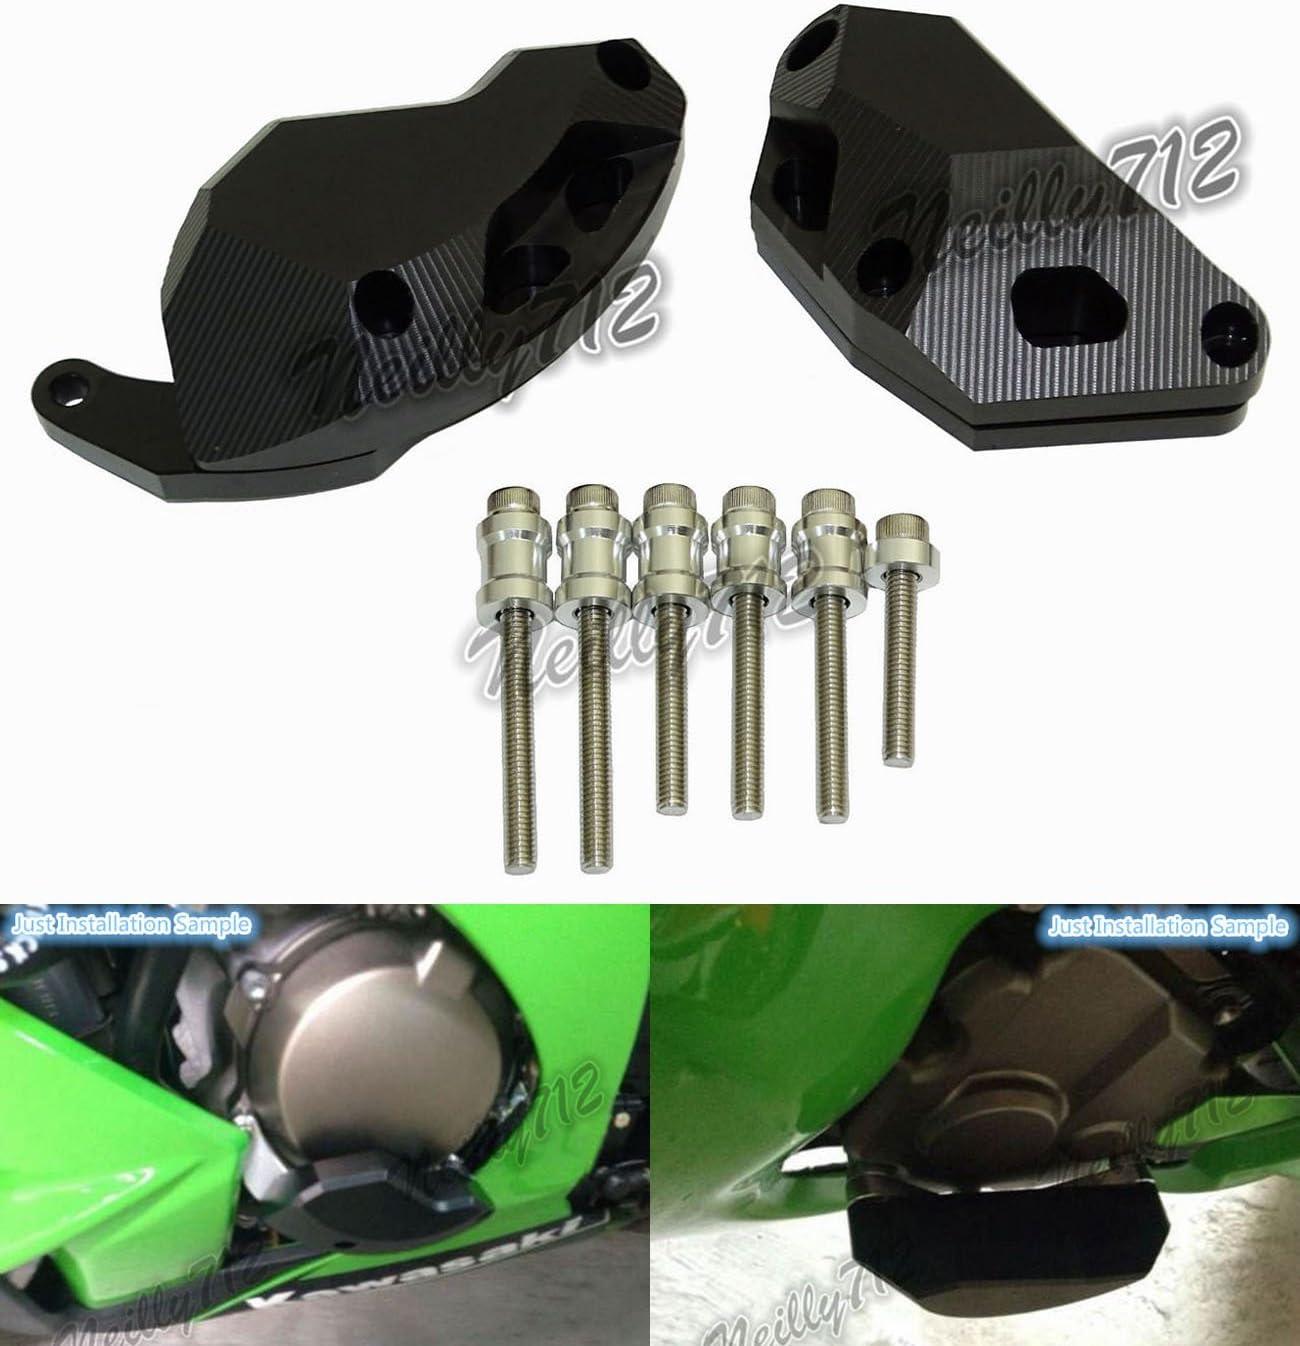 Engine Guard Slider Cover Protector for Kawasaki Ninja ZX10R 2011-2017 Green